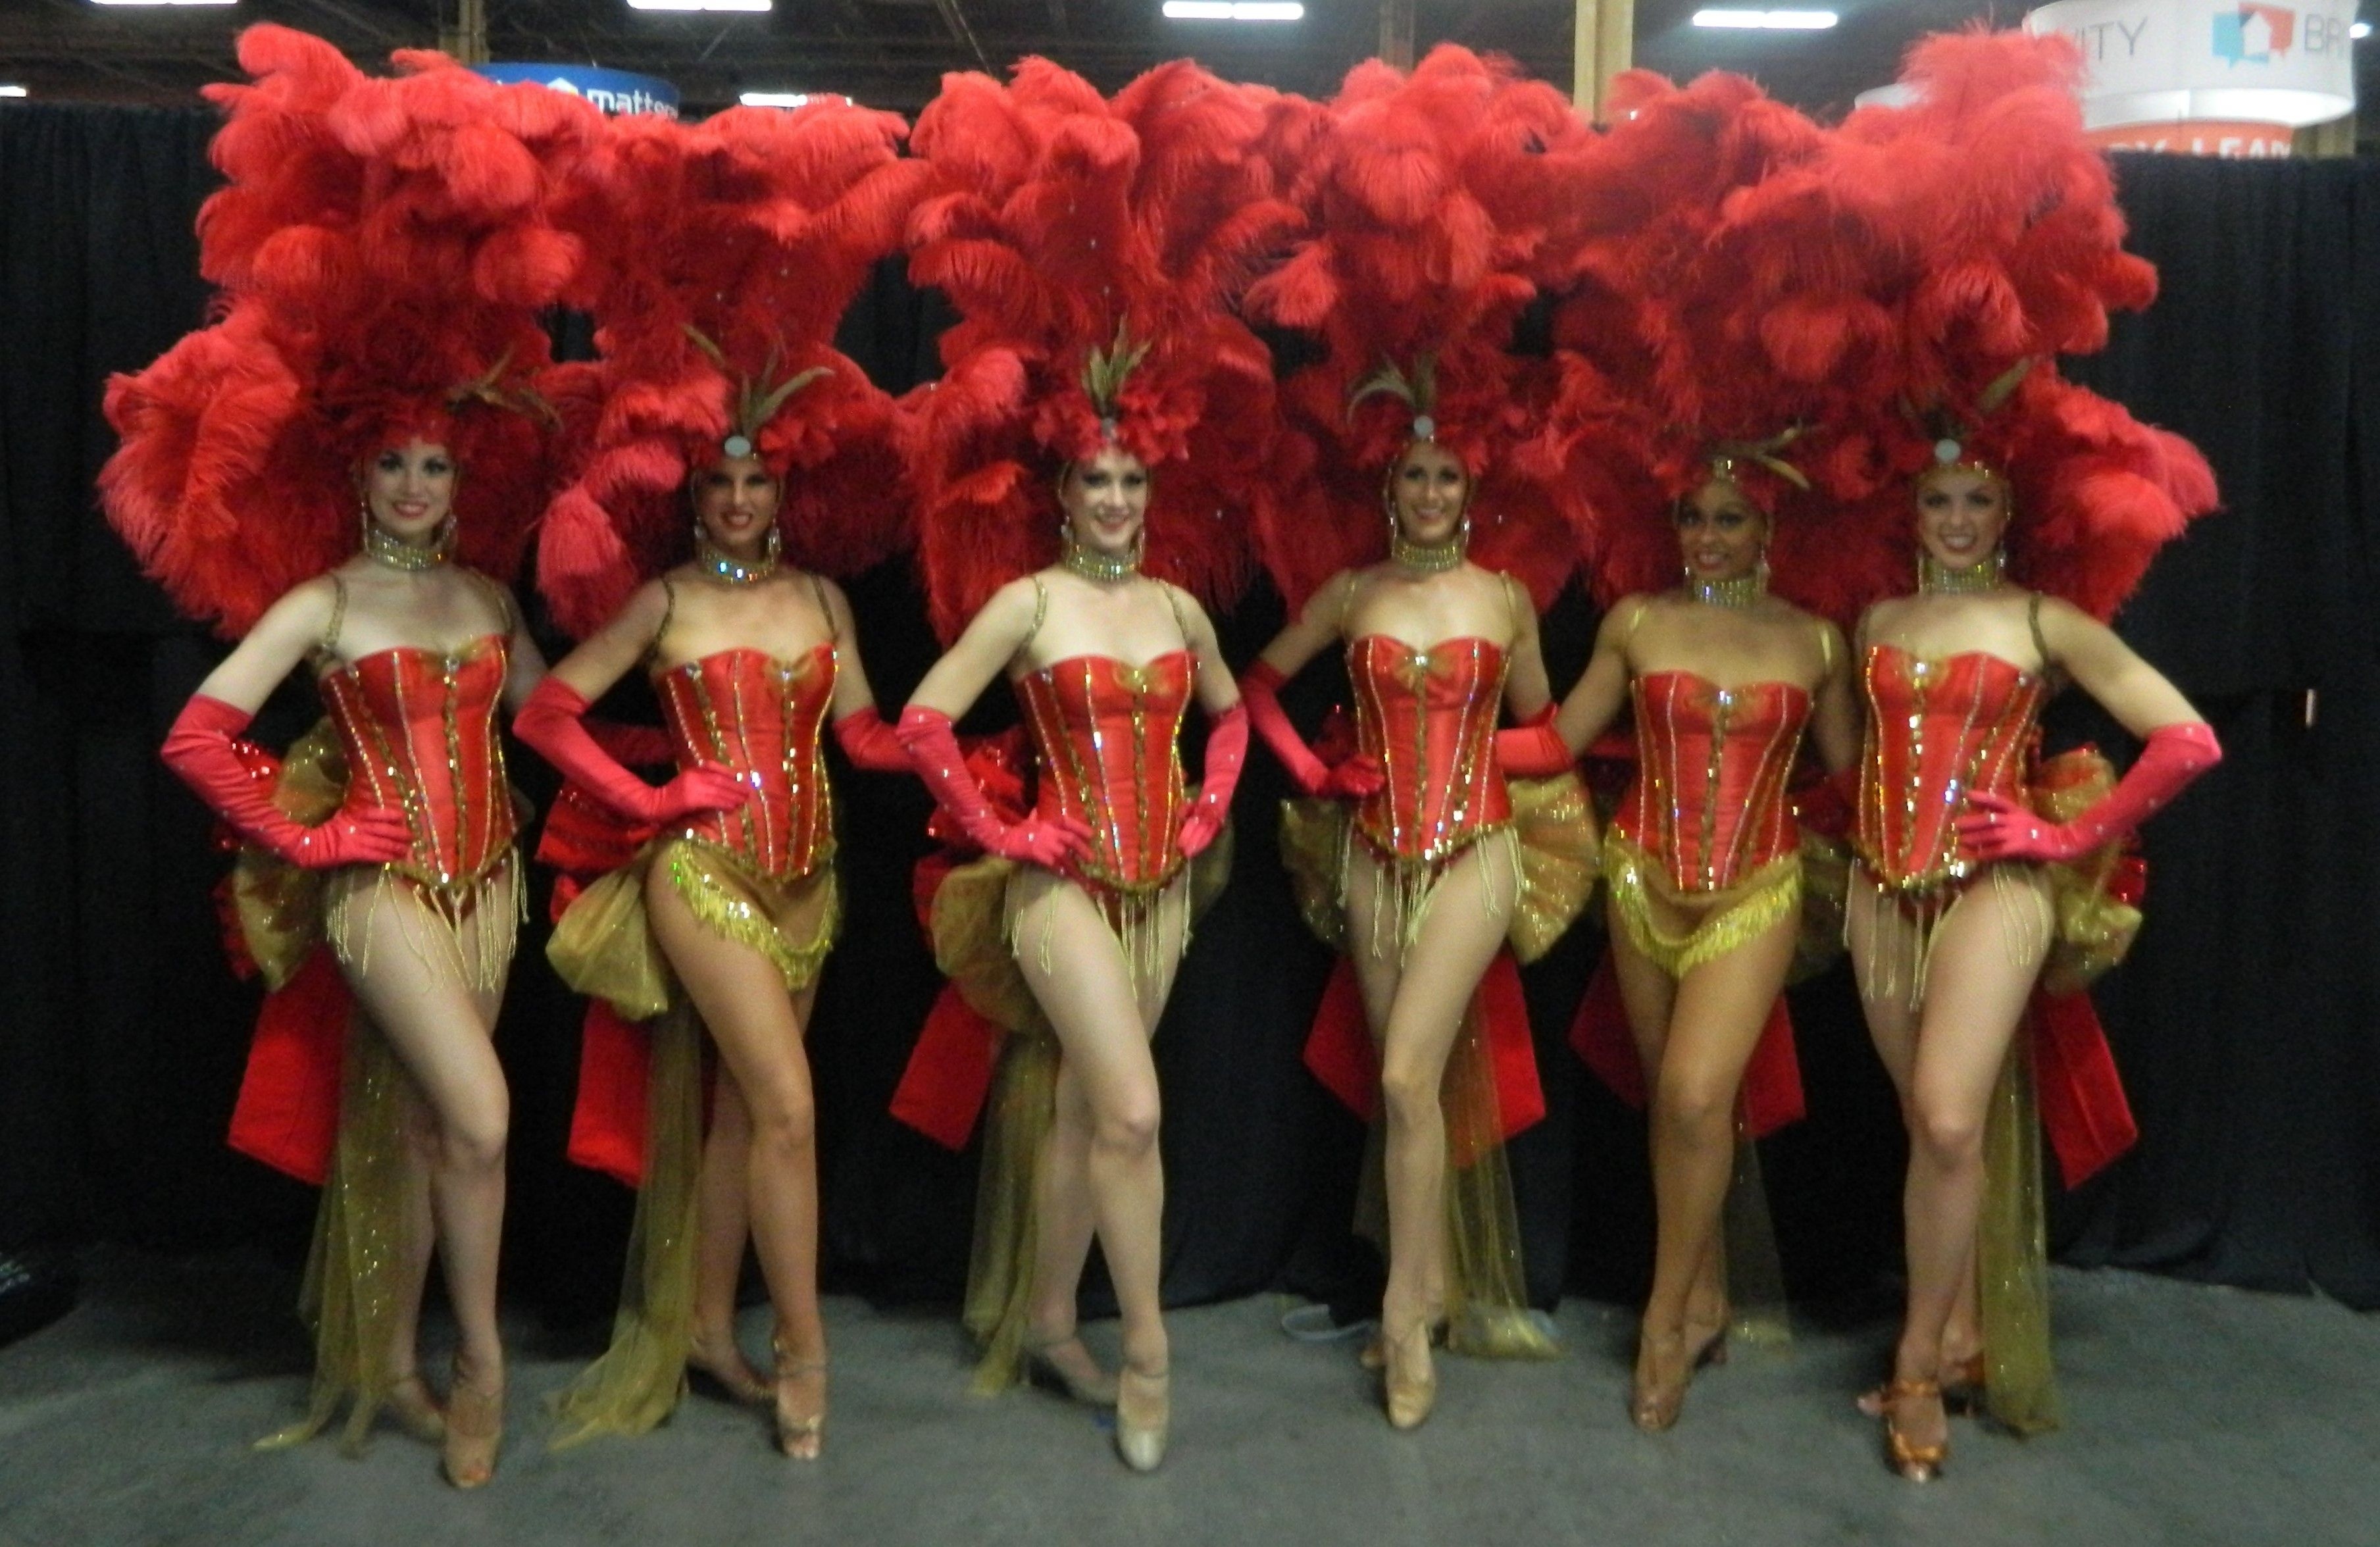 Beautiful Red & Gold Las Vegas Showgirl Costumes, Corporate Friendly. Premier Showgirls of Las ...